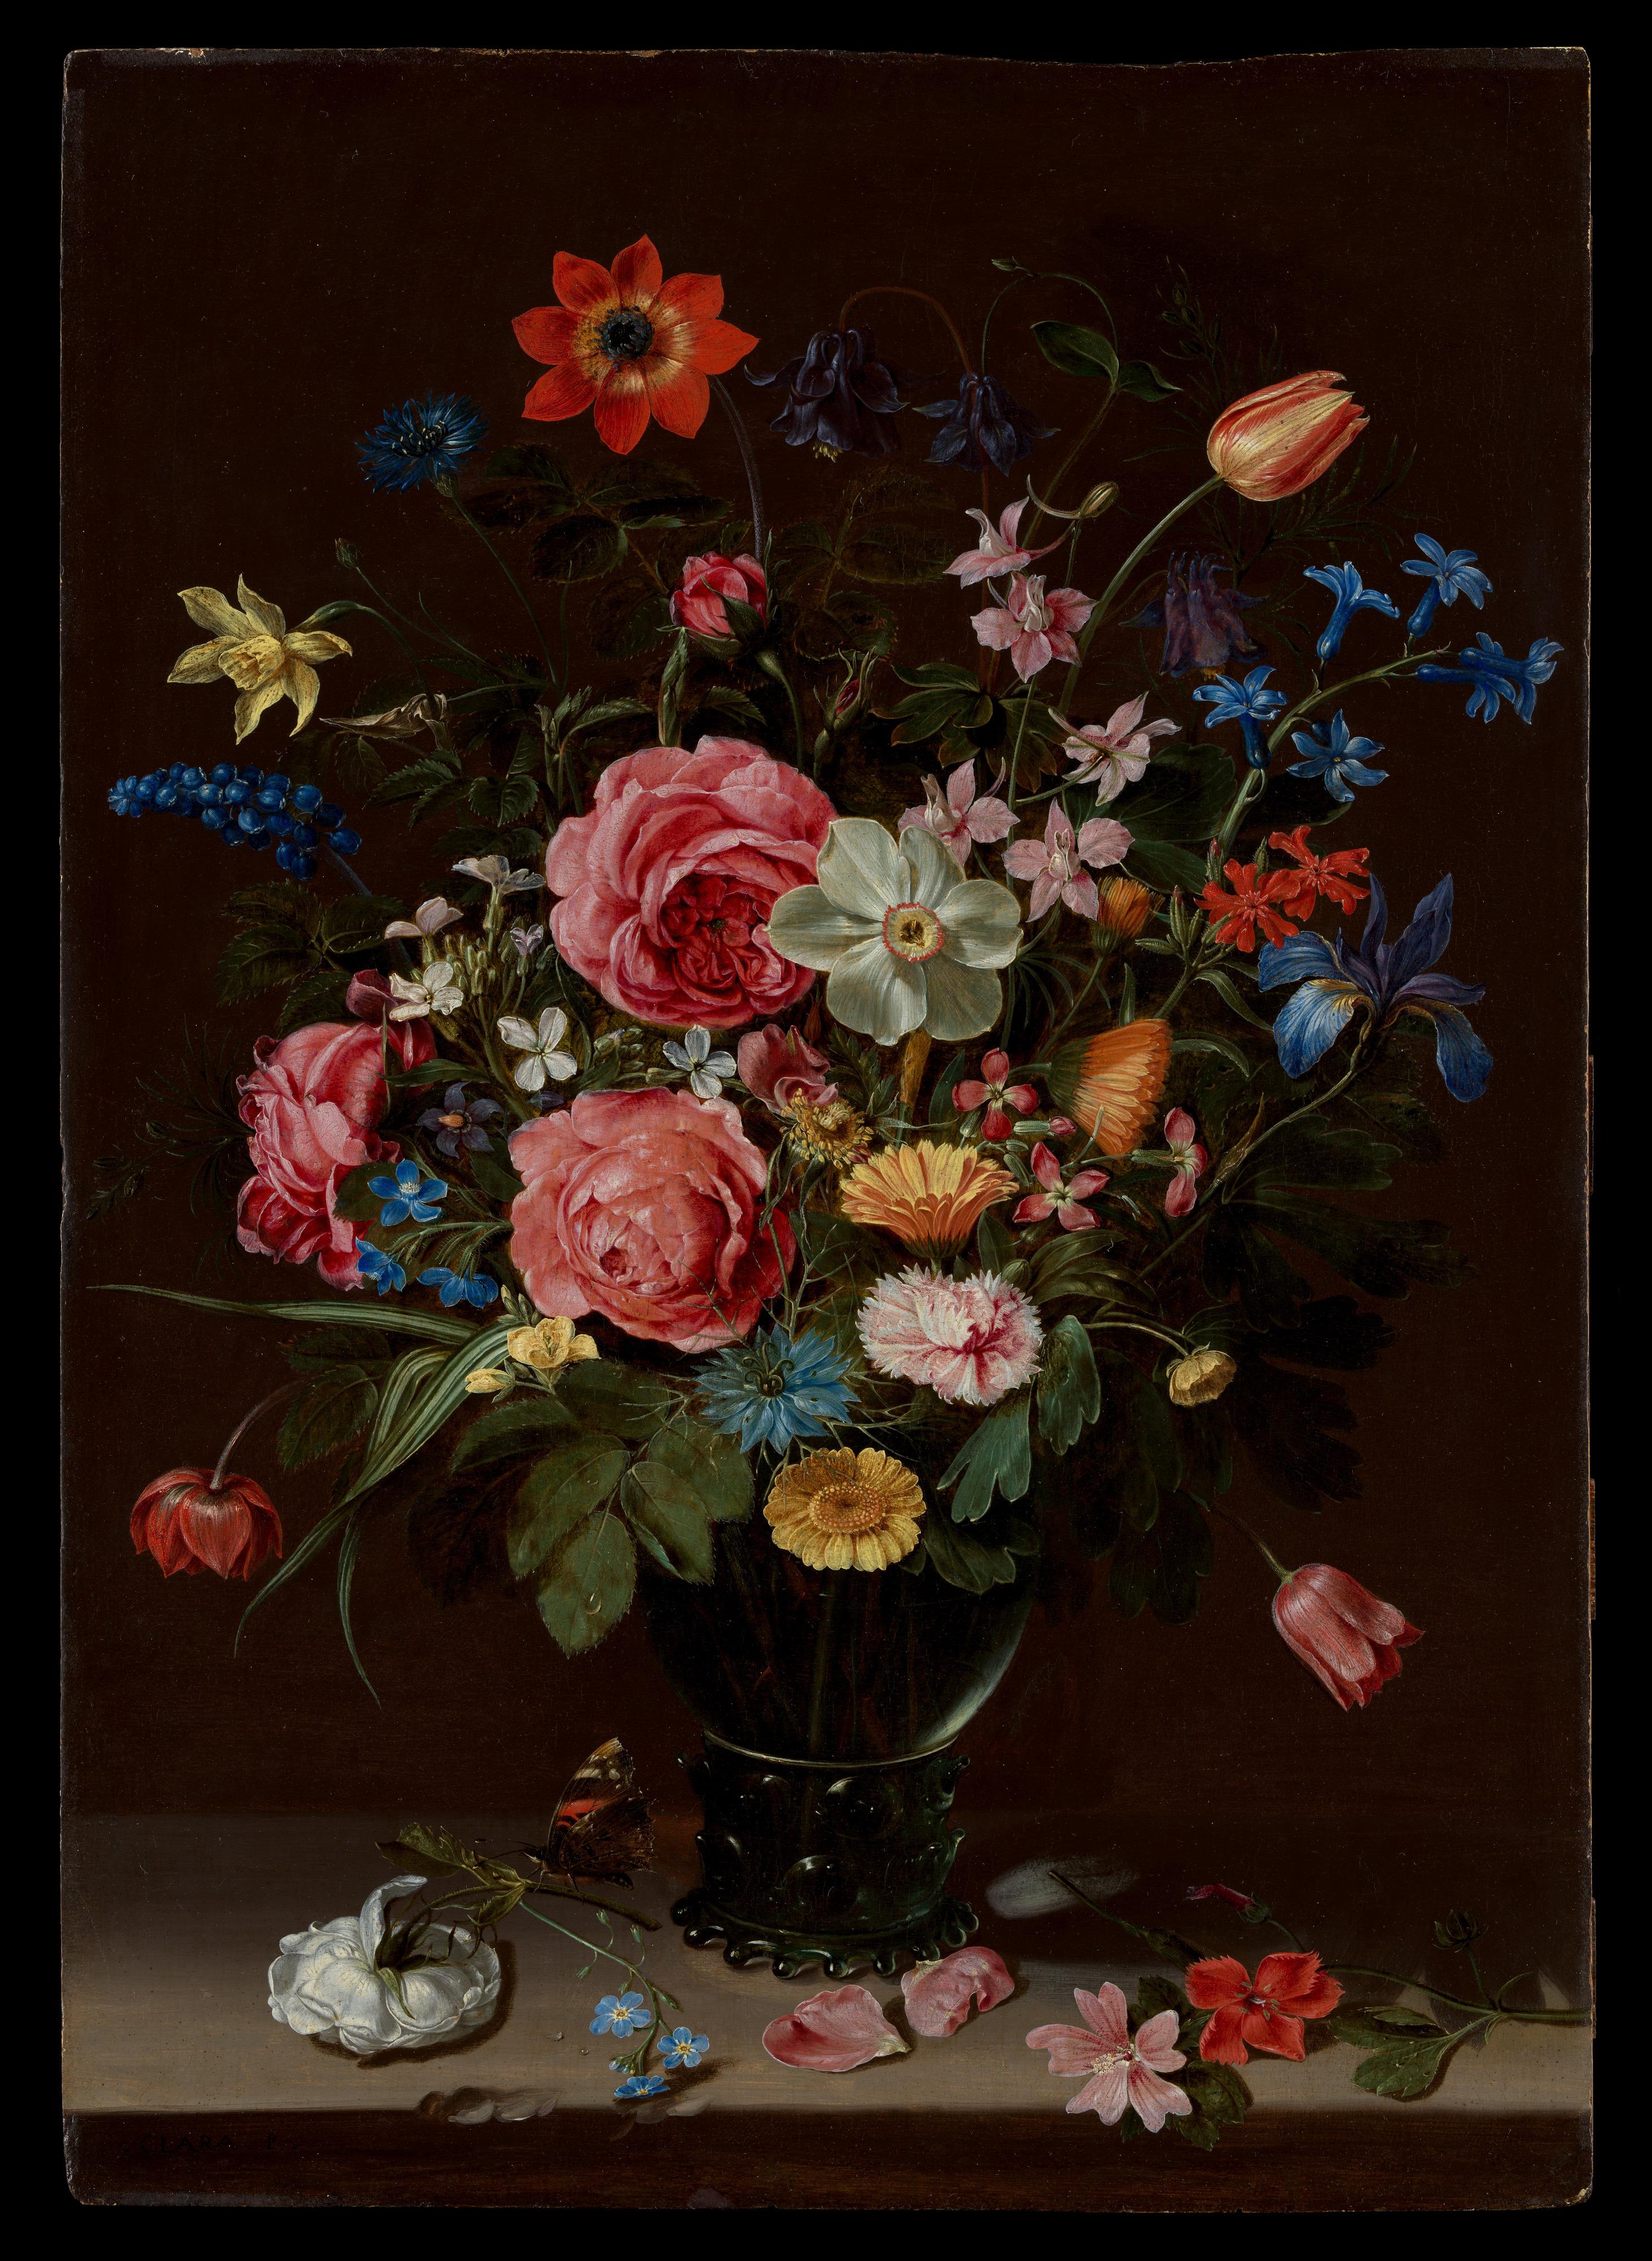 Clara Peeters A Bouquet Of Flowers The Metropolitan Museum Of Art